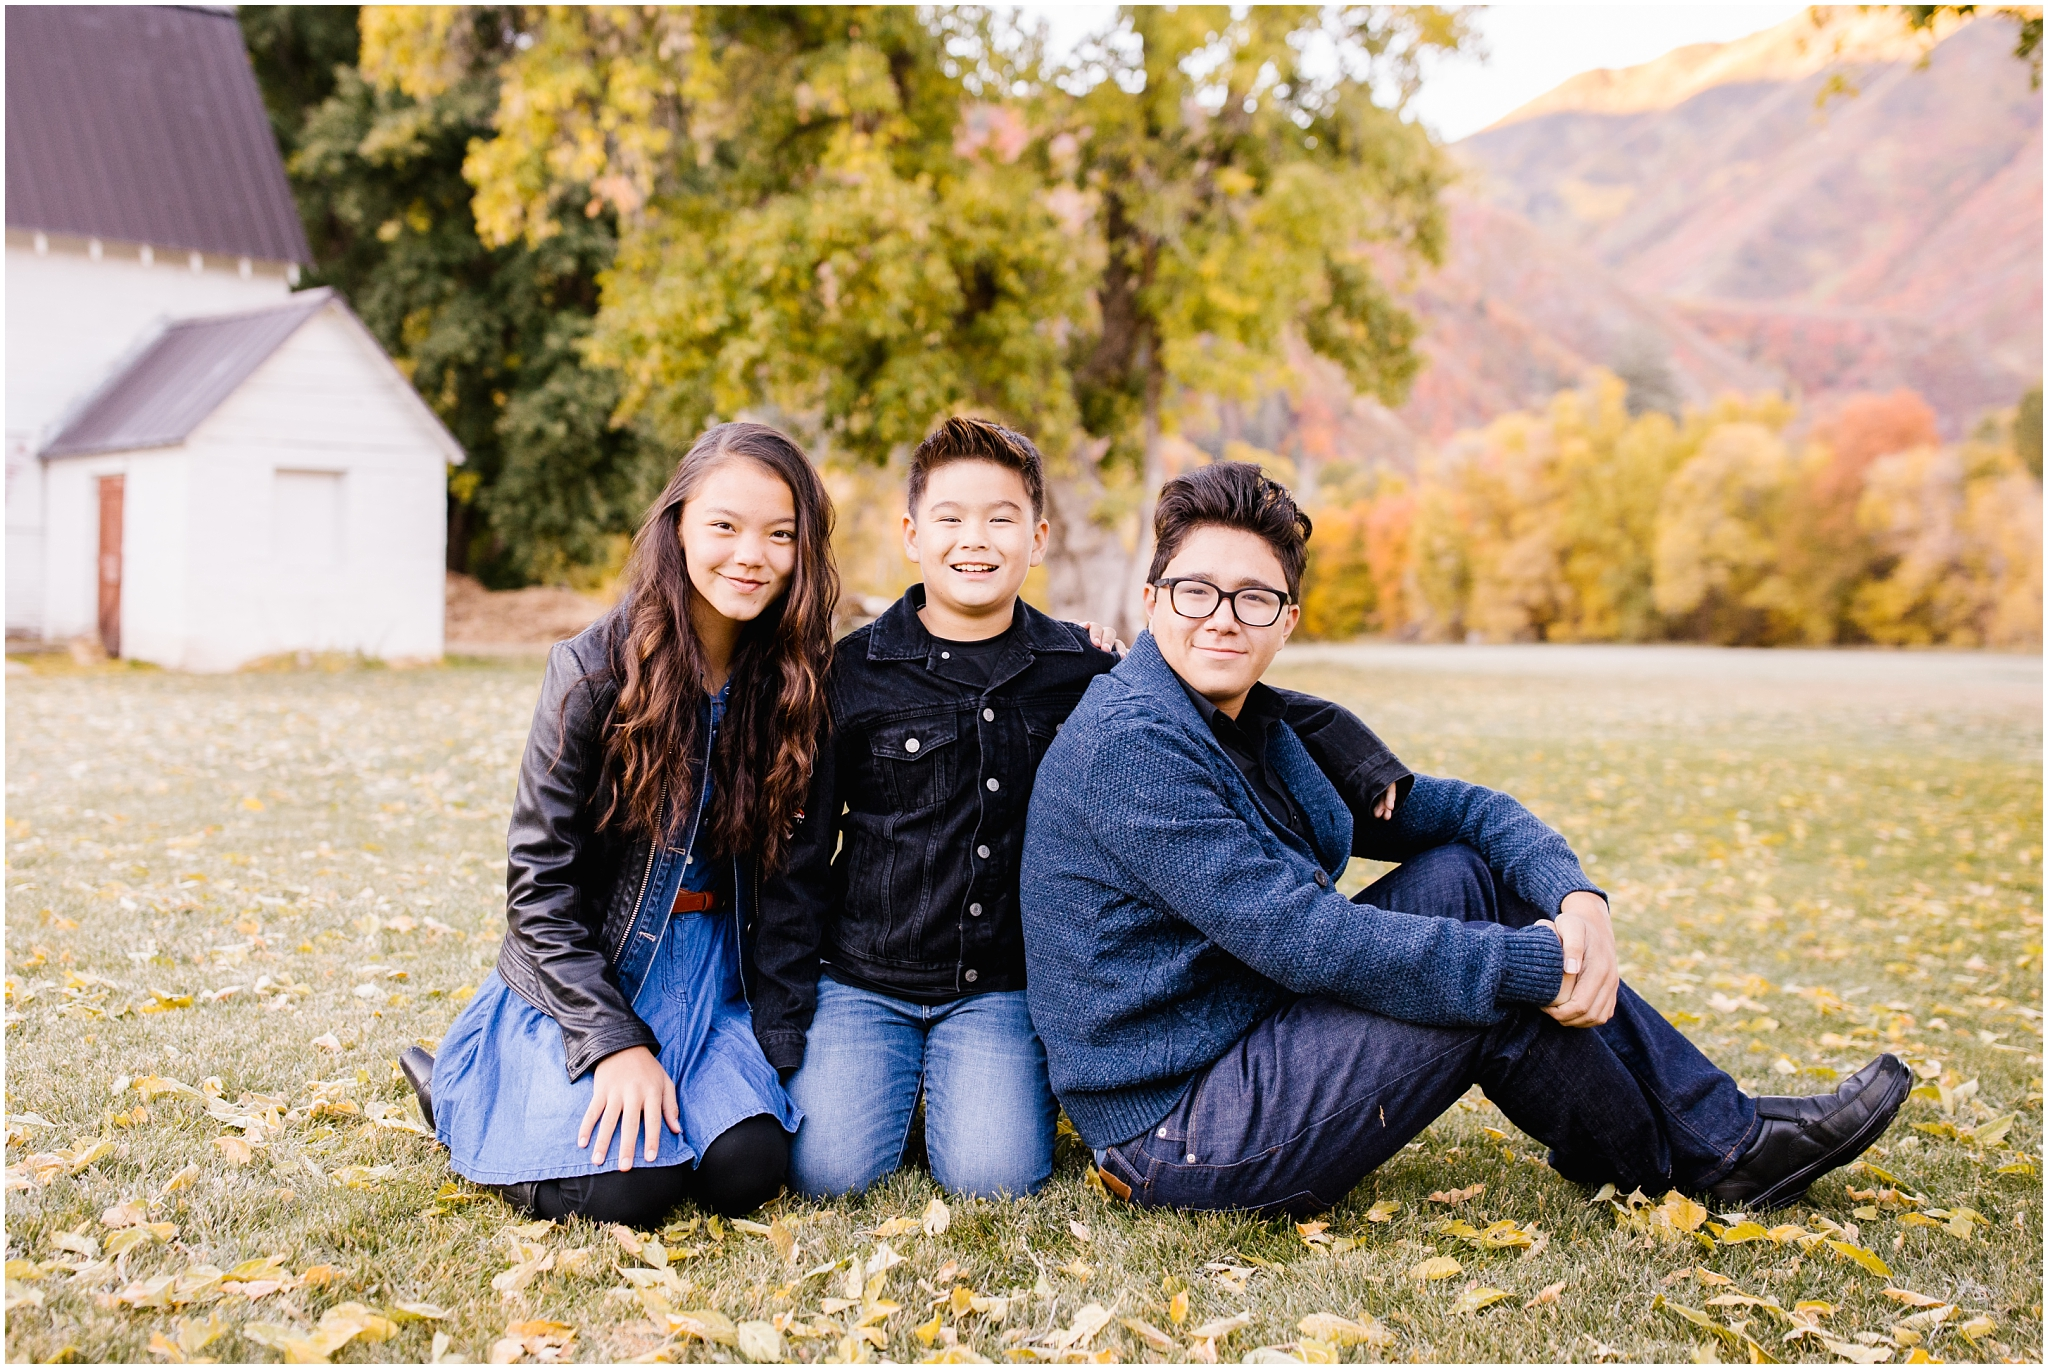 Qian-2_Lizzie-B-Imagery-Utah-Family-Photographer-Salt-Lake-City-Park-City-Utah-County-Hobble-Creek-Canyon-Jolleys-Ranch.jpg